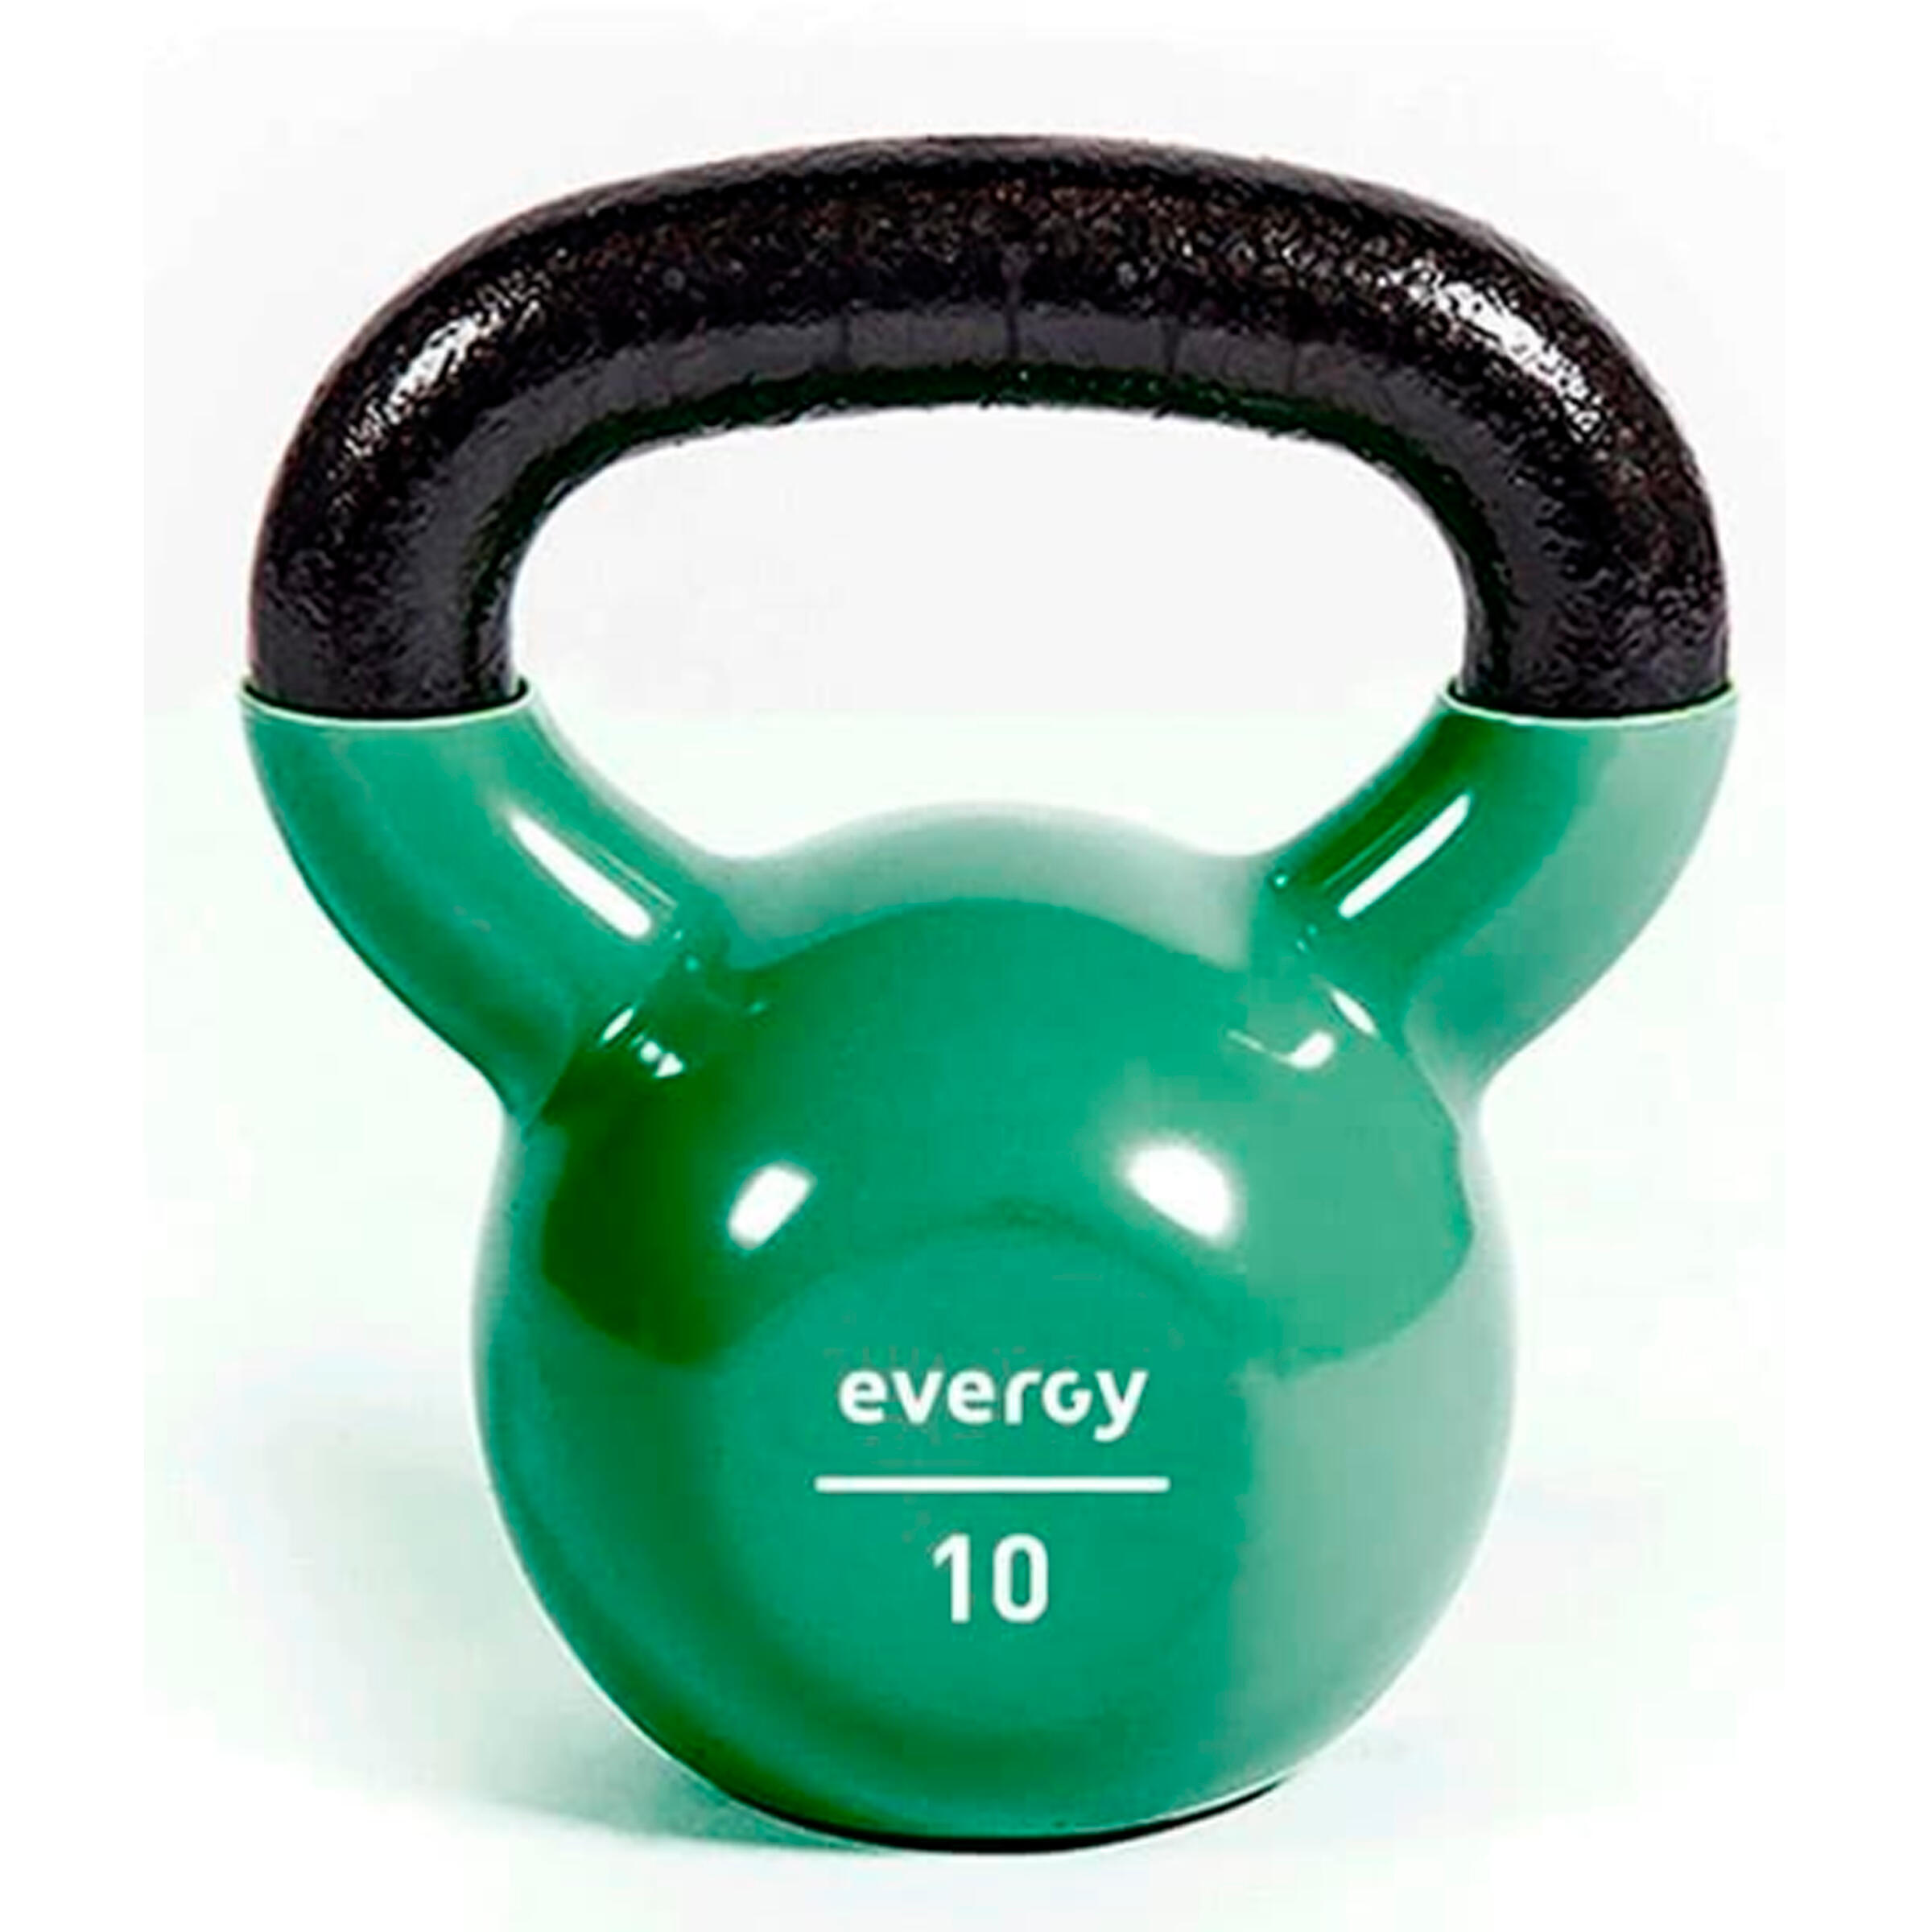 Kettlebell Pesa Rusa 10kg. Evergy Cross Fitness Musculación